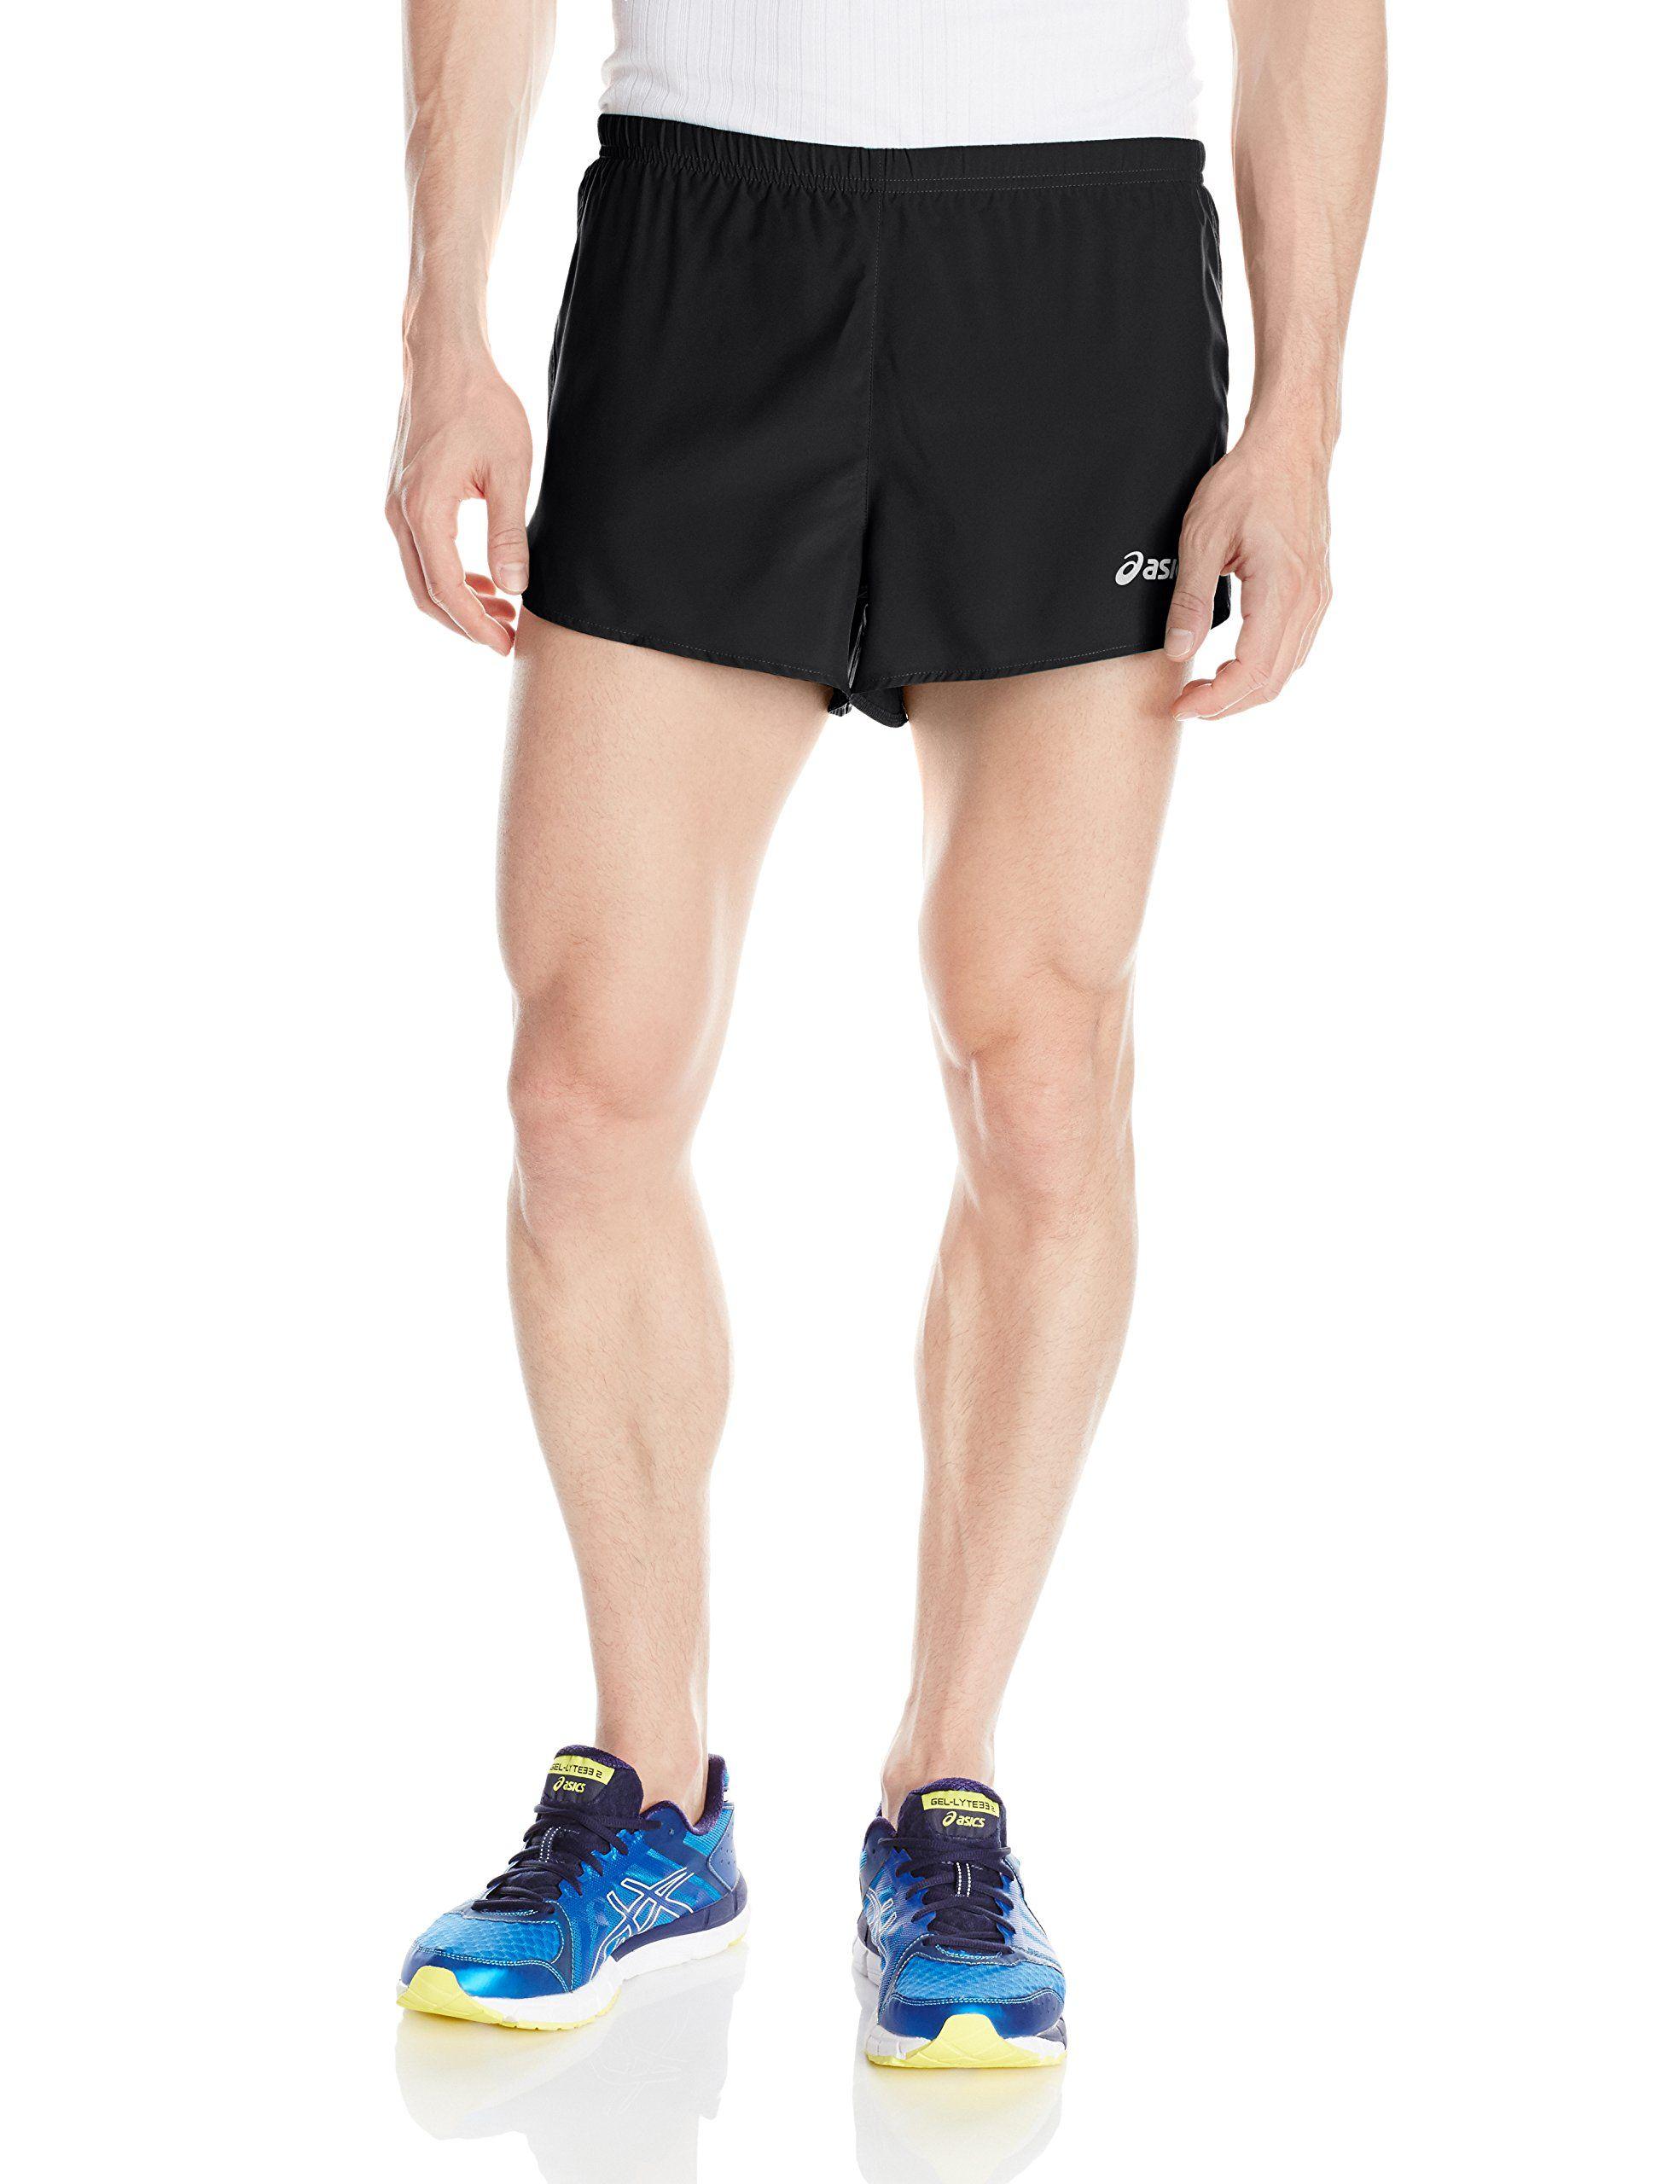 ASICS Men's Performance Run 3 Inch Split Shorts, Performance